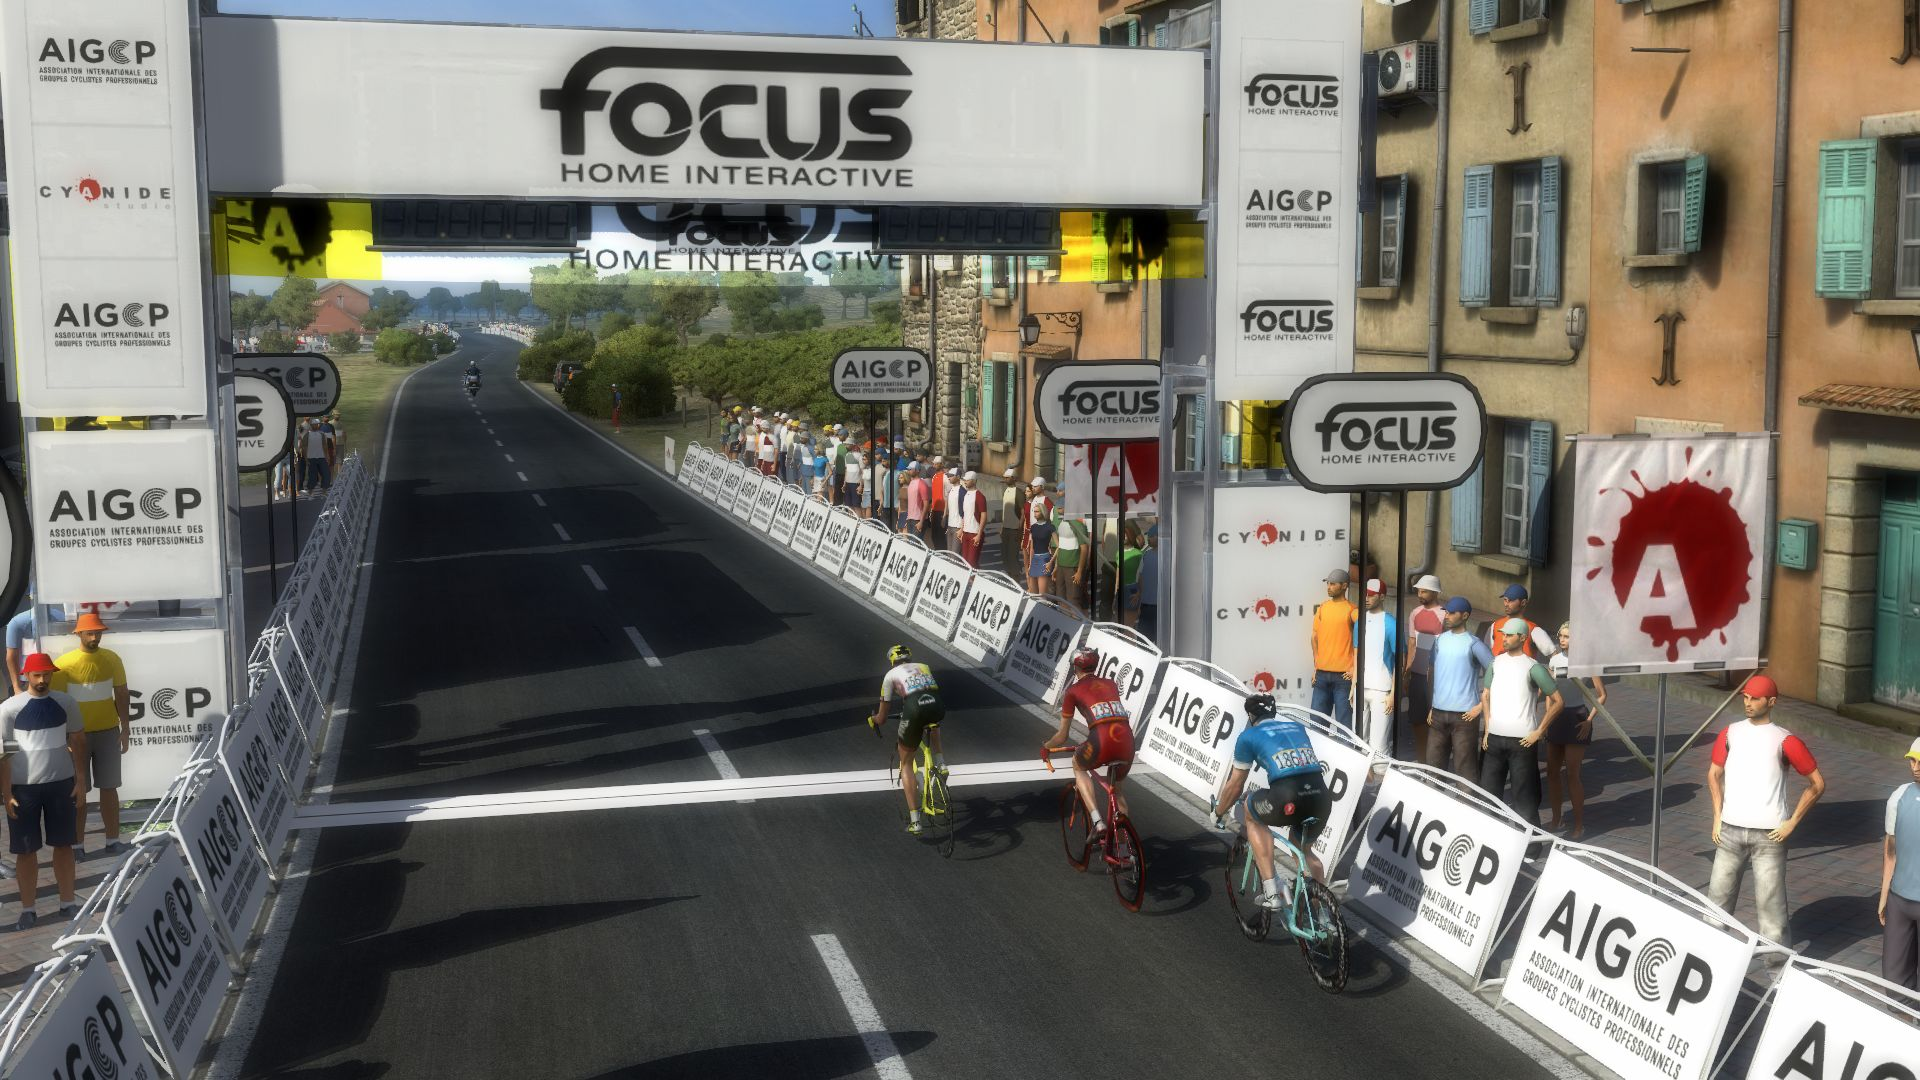 pcmdaily.com/images/mg/2019/Races/PT/Tirreno/mg19_ta_s07_16.jpg